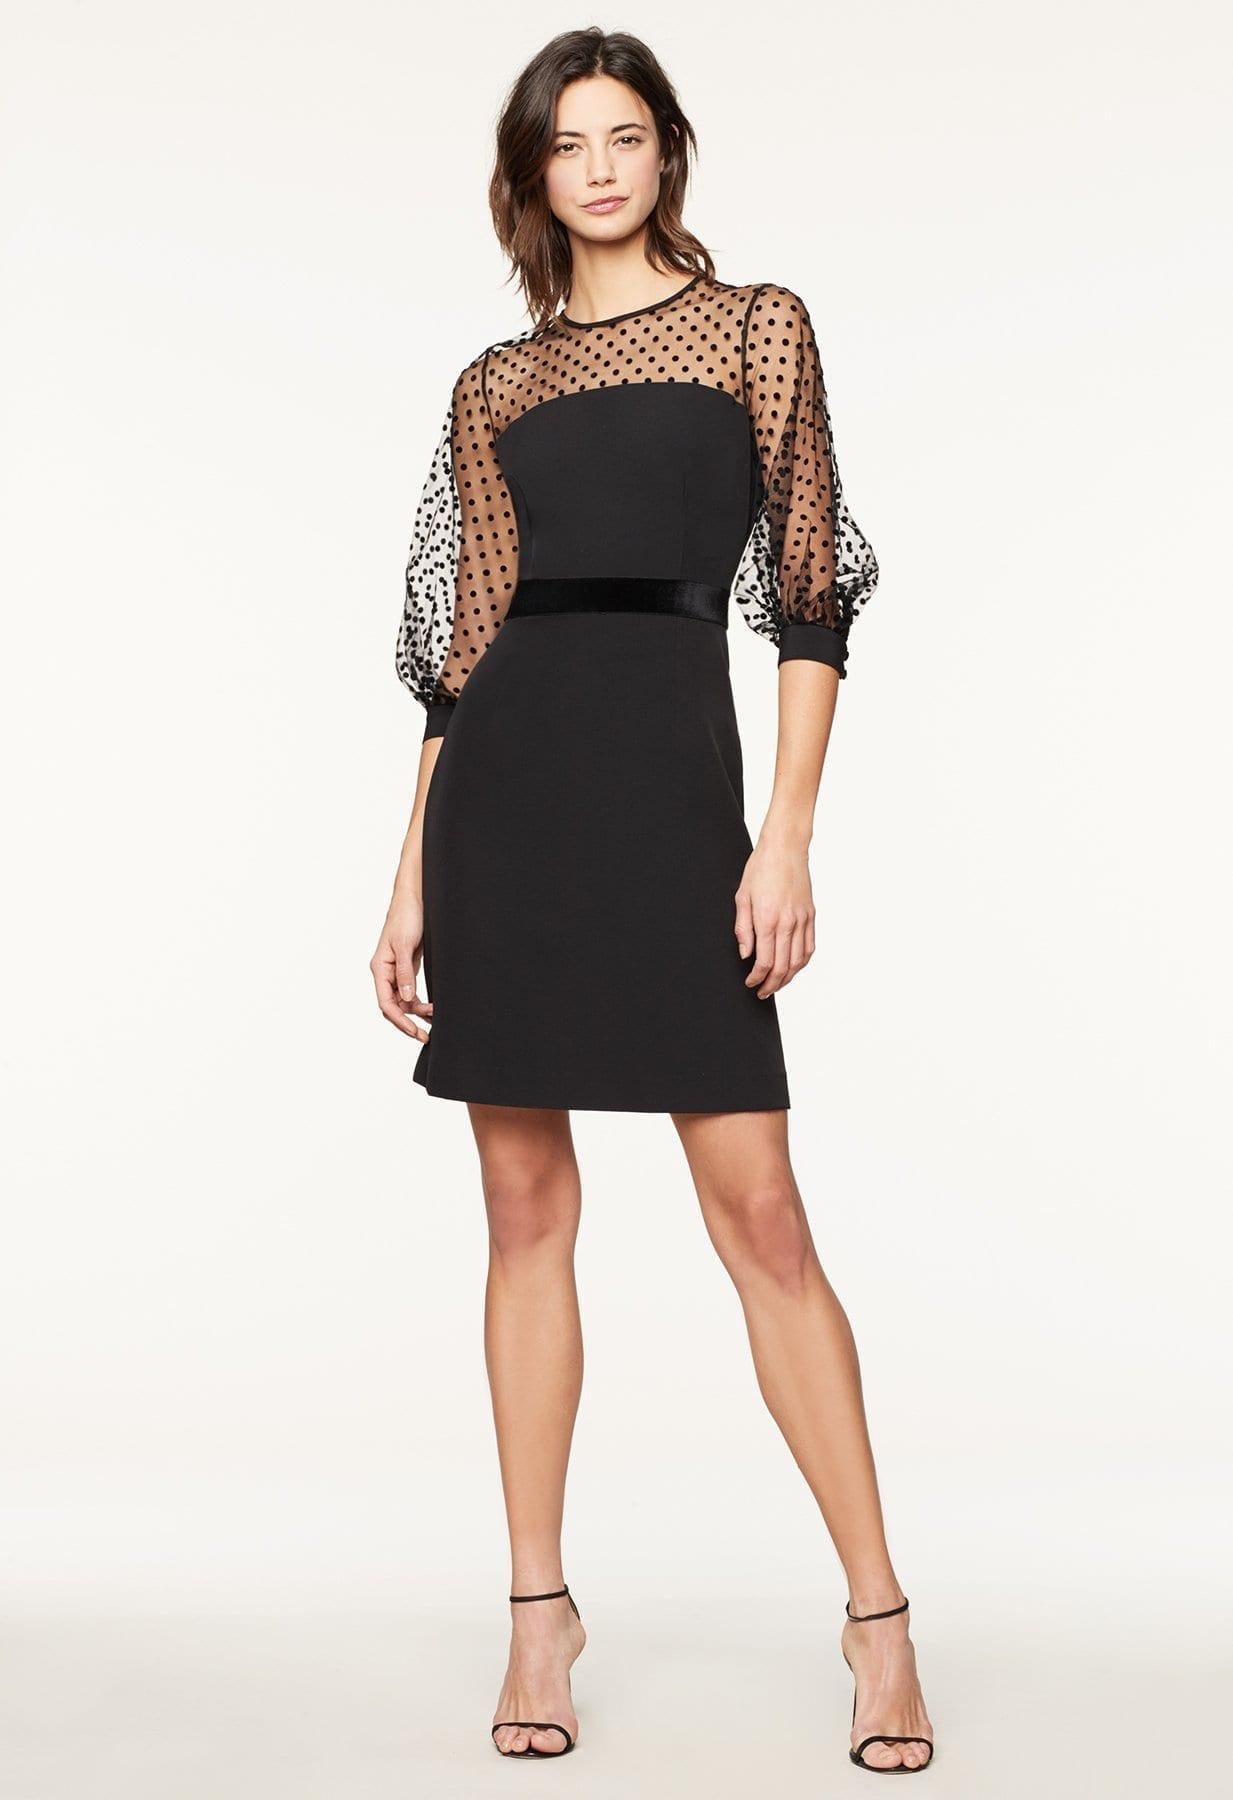 MILLY Italian Cady Milan Black Dress